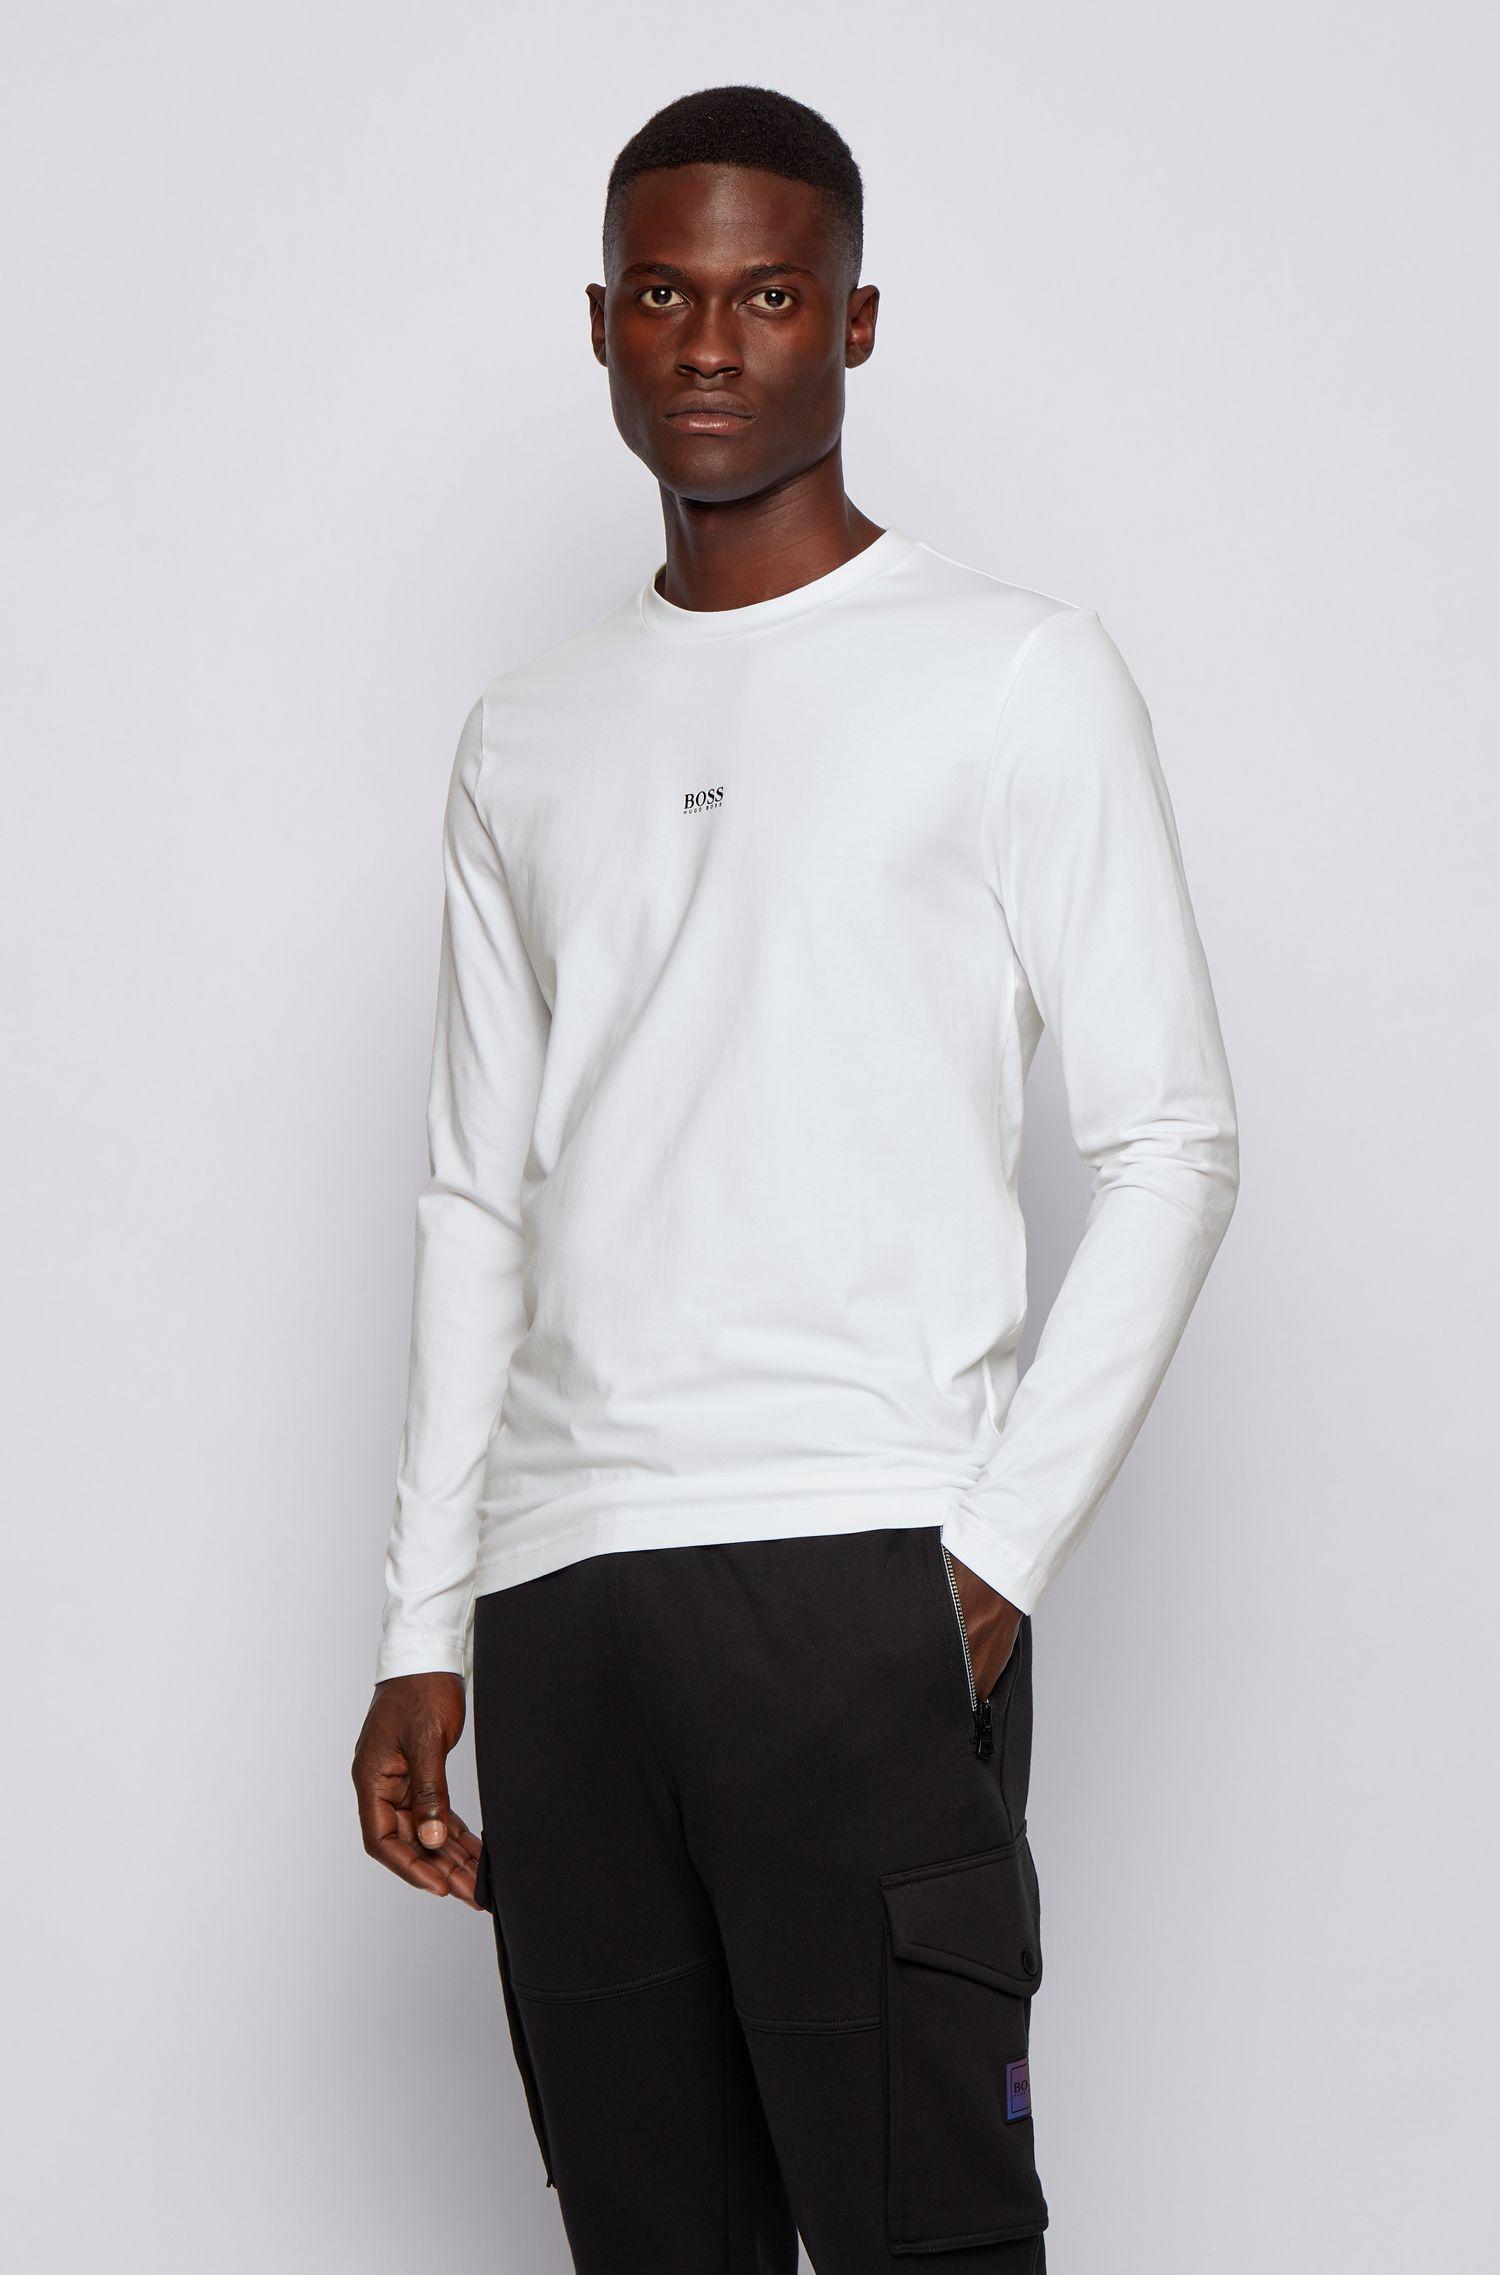 HUGO BOSS 雨果博斯 弹力棉 男式T恤 5.2折$28.8起 海淘转运到手约¥199